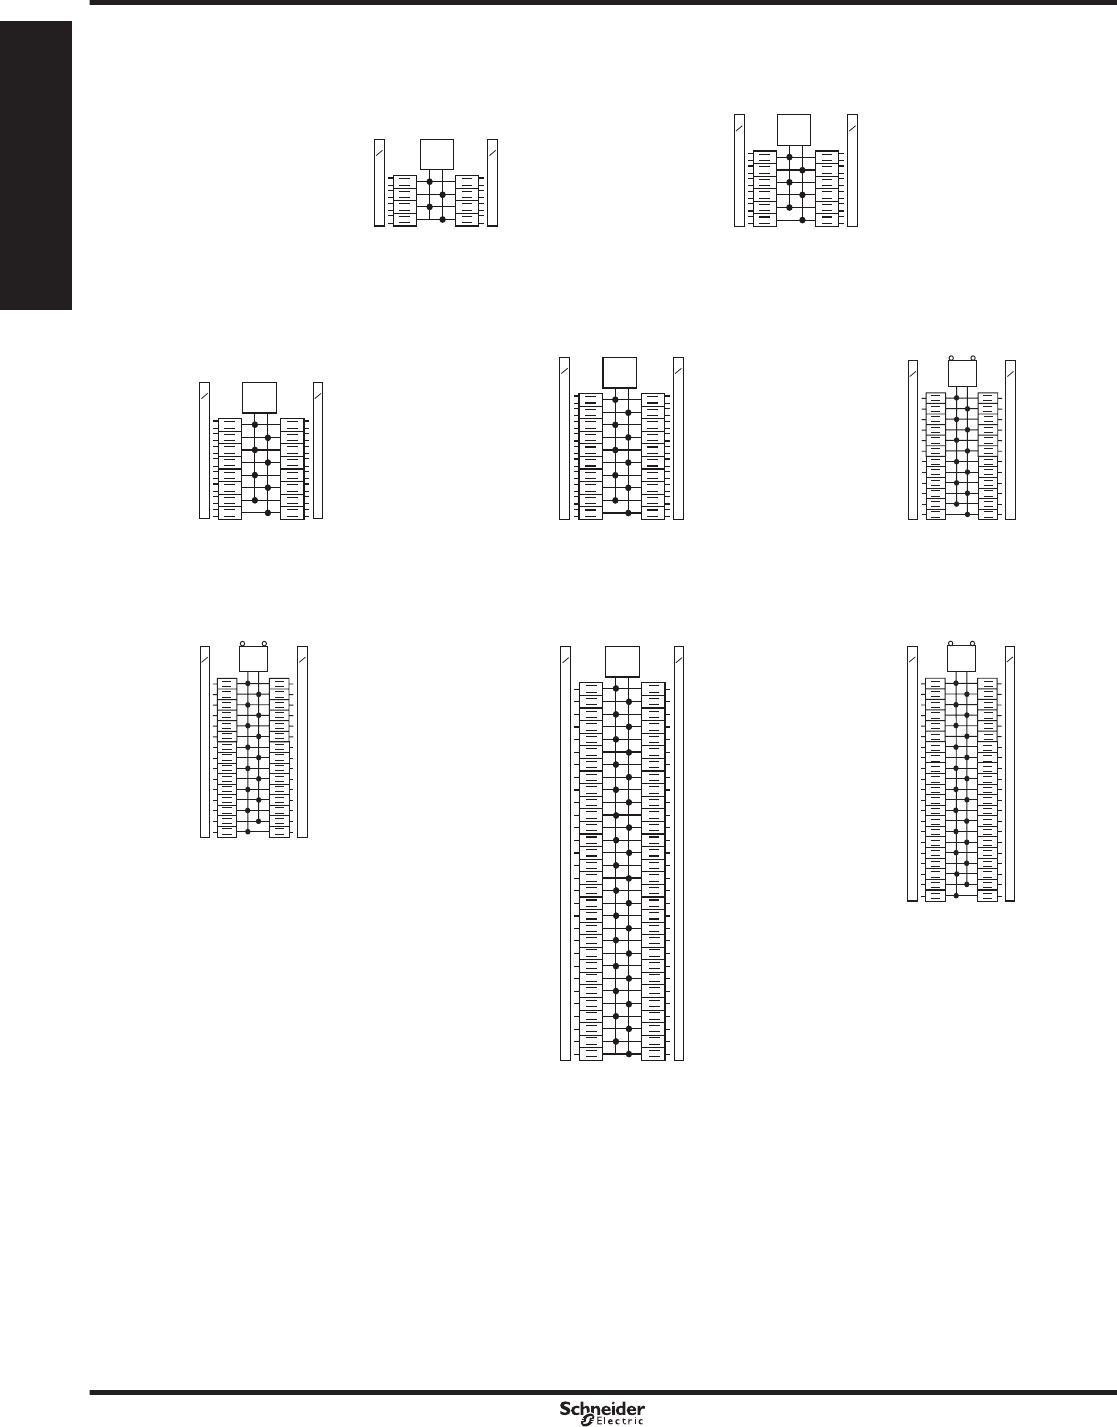 De1 P01 2 Toc 121233 Catalog Square D Qo Qwikgard 20 Amp Twopole Gfci Breakerqo220gficp The Canadian Homeline Circuit Breakers And Loadcentres